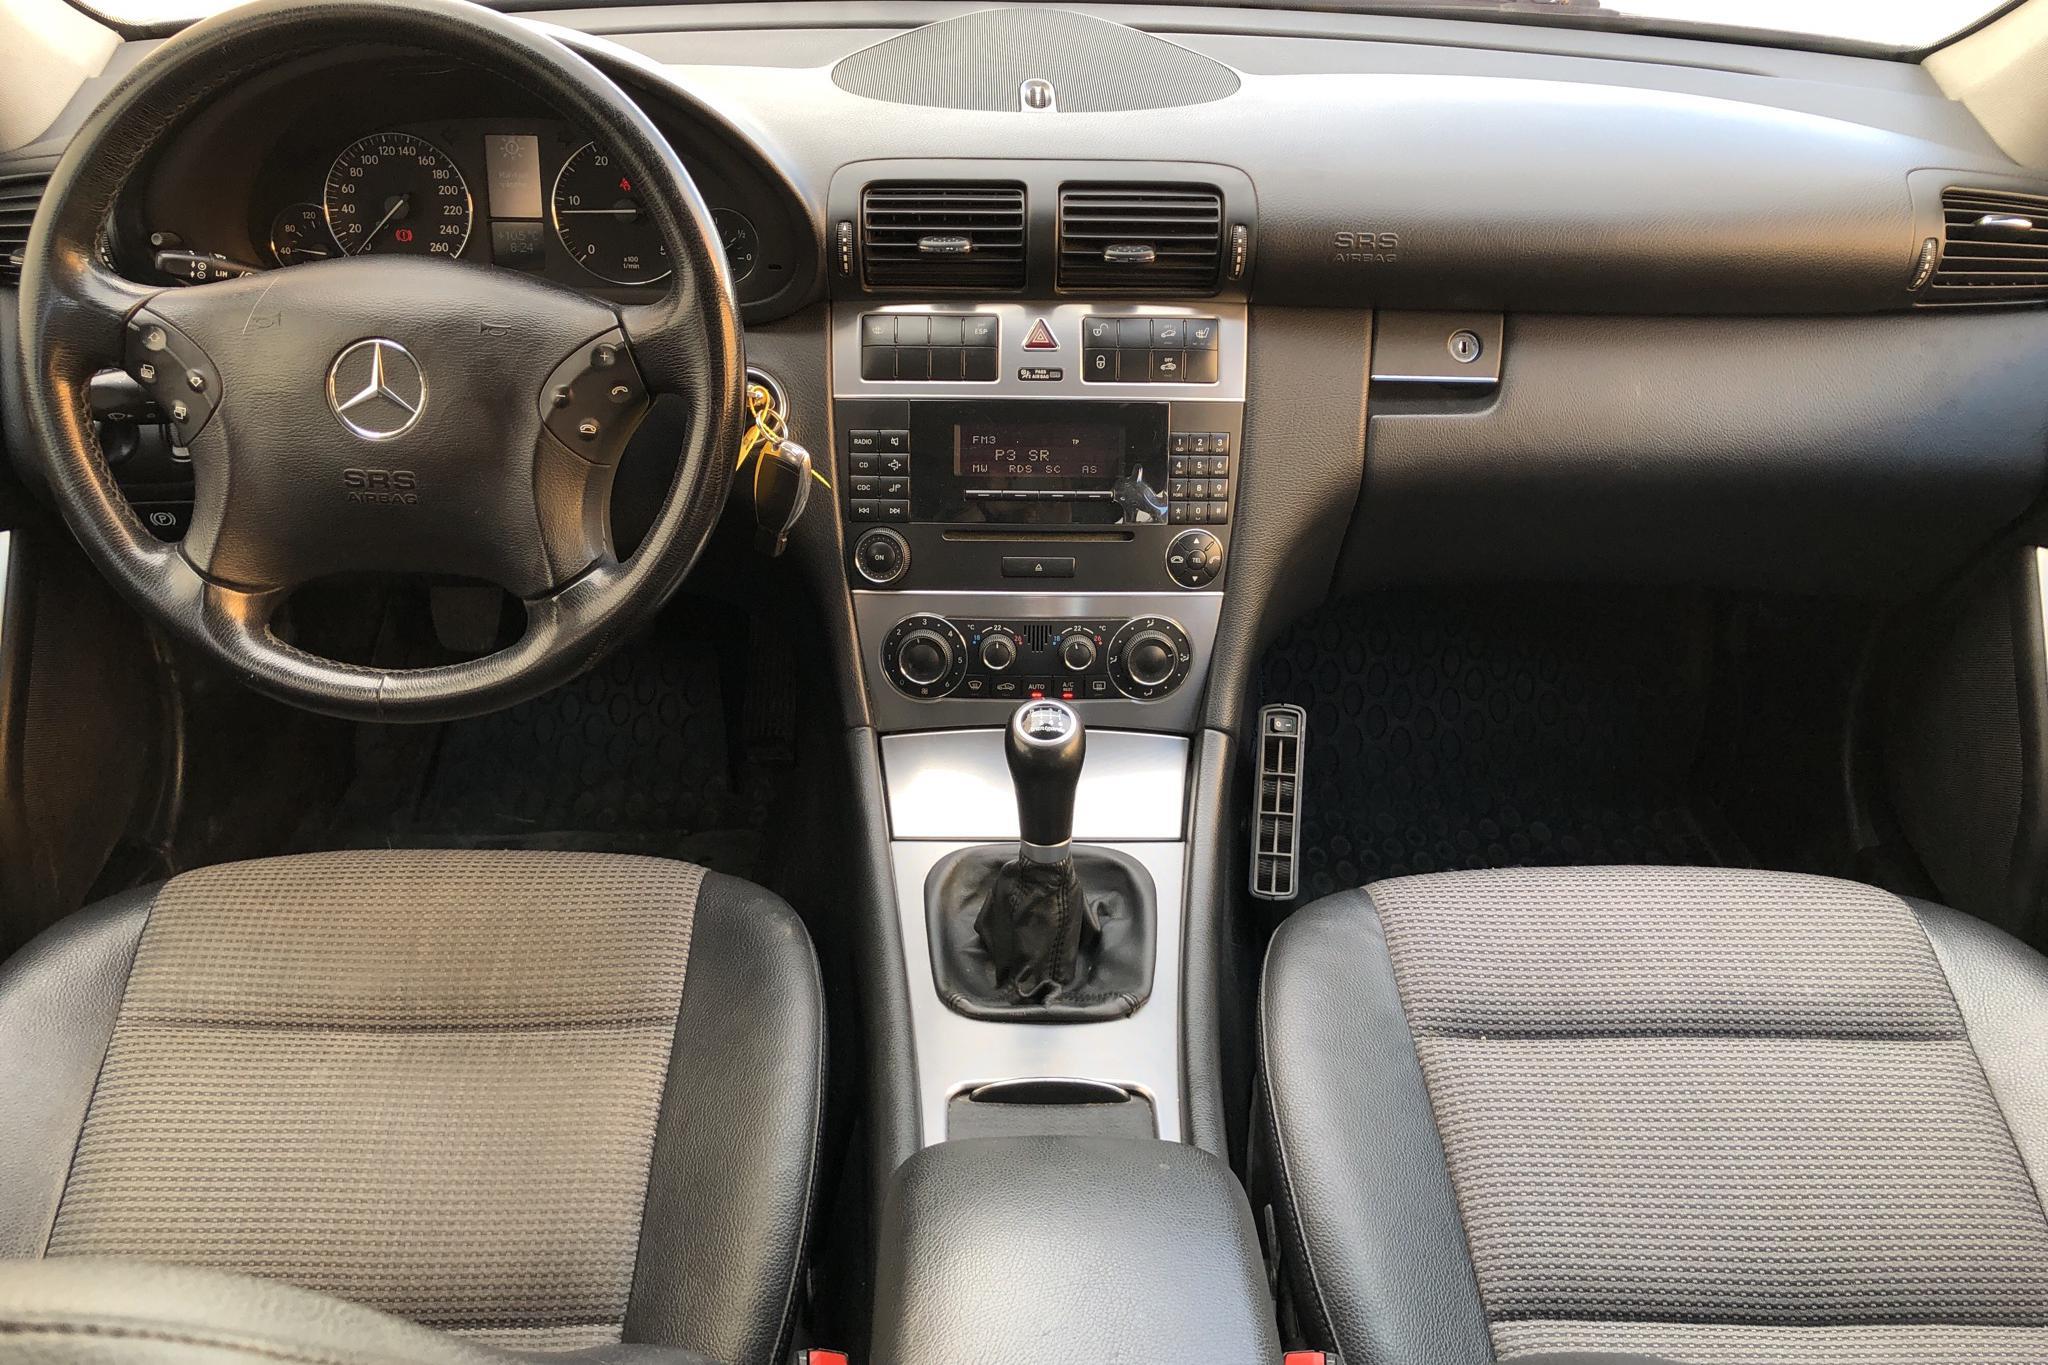 Mercedes C 220 CDI Kombi W203 (150hk) - 20 725 mil - Manuell - silver - 2007